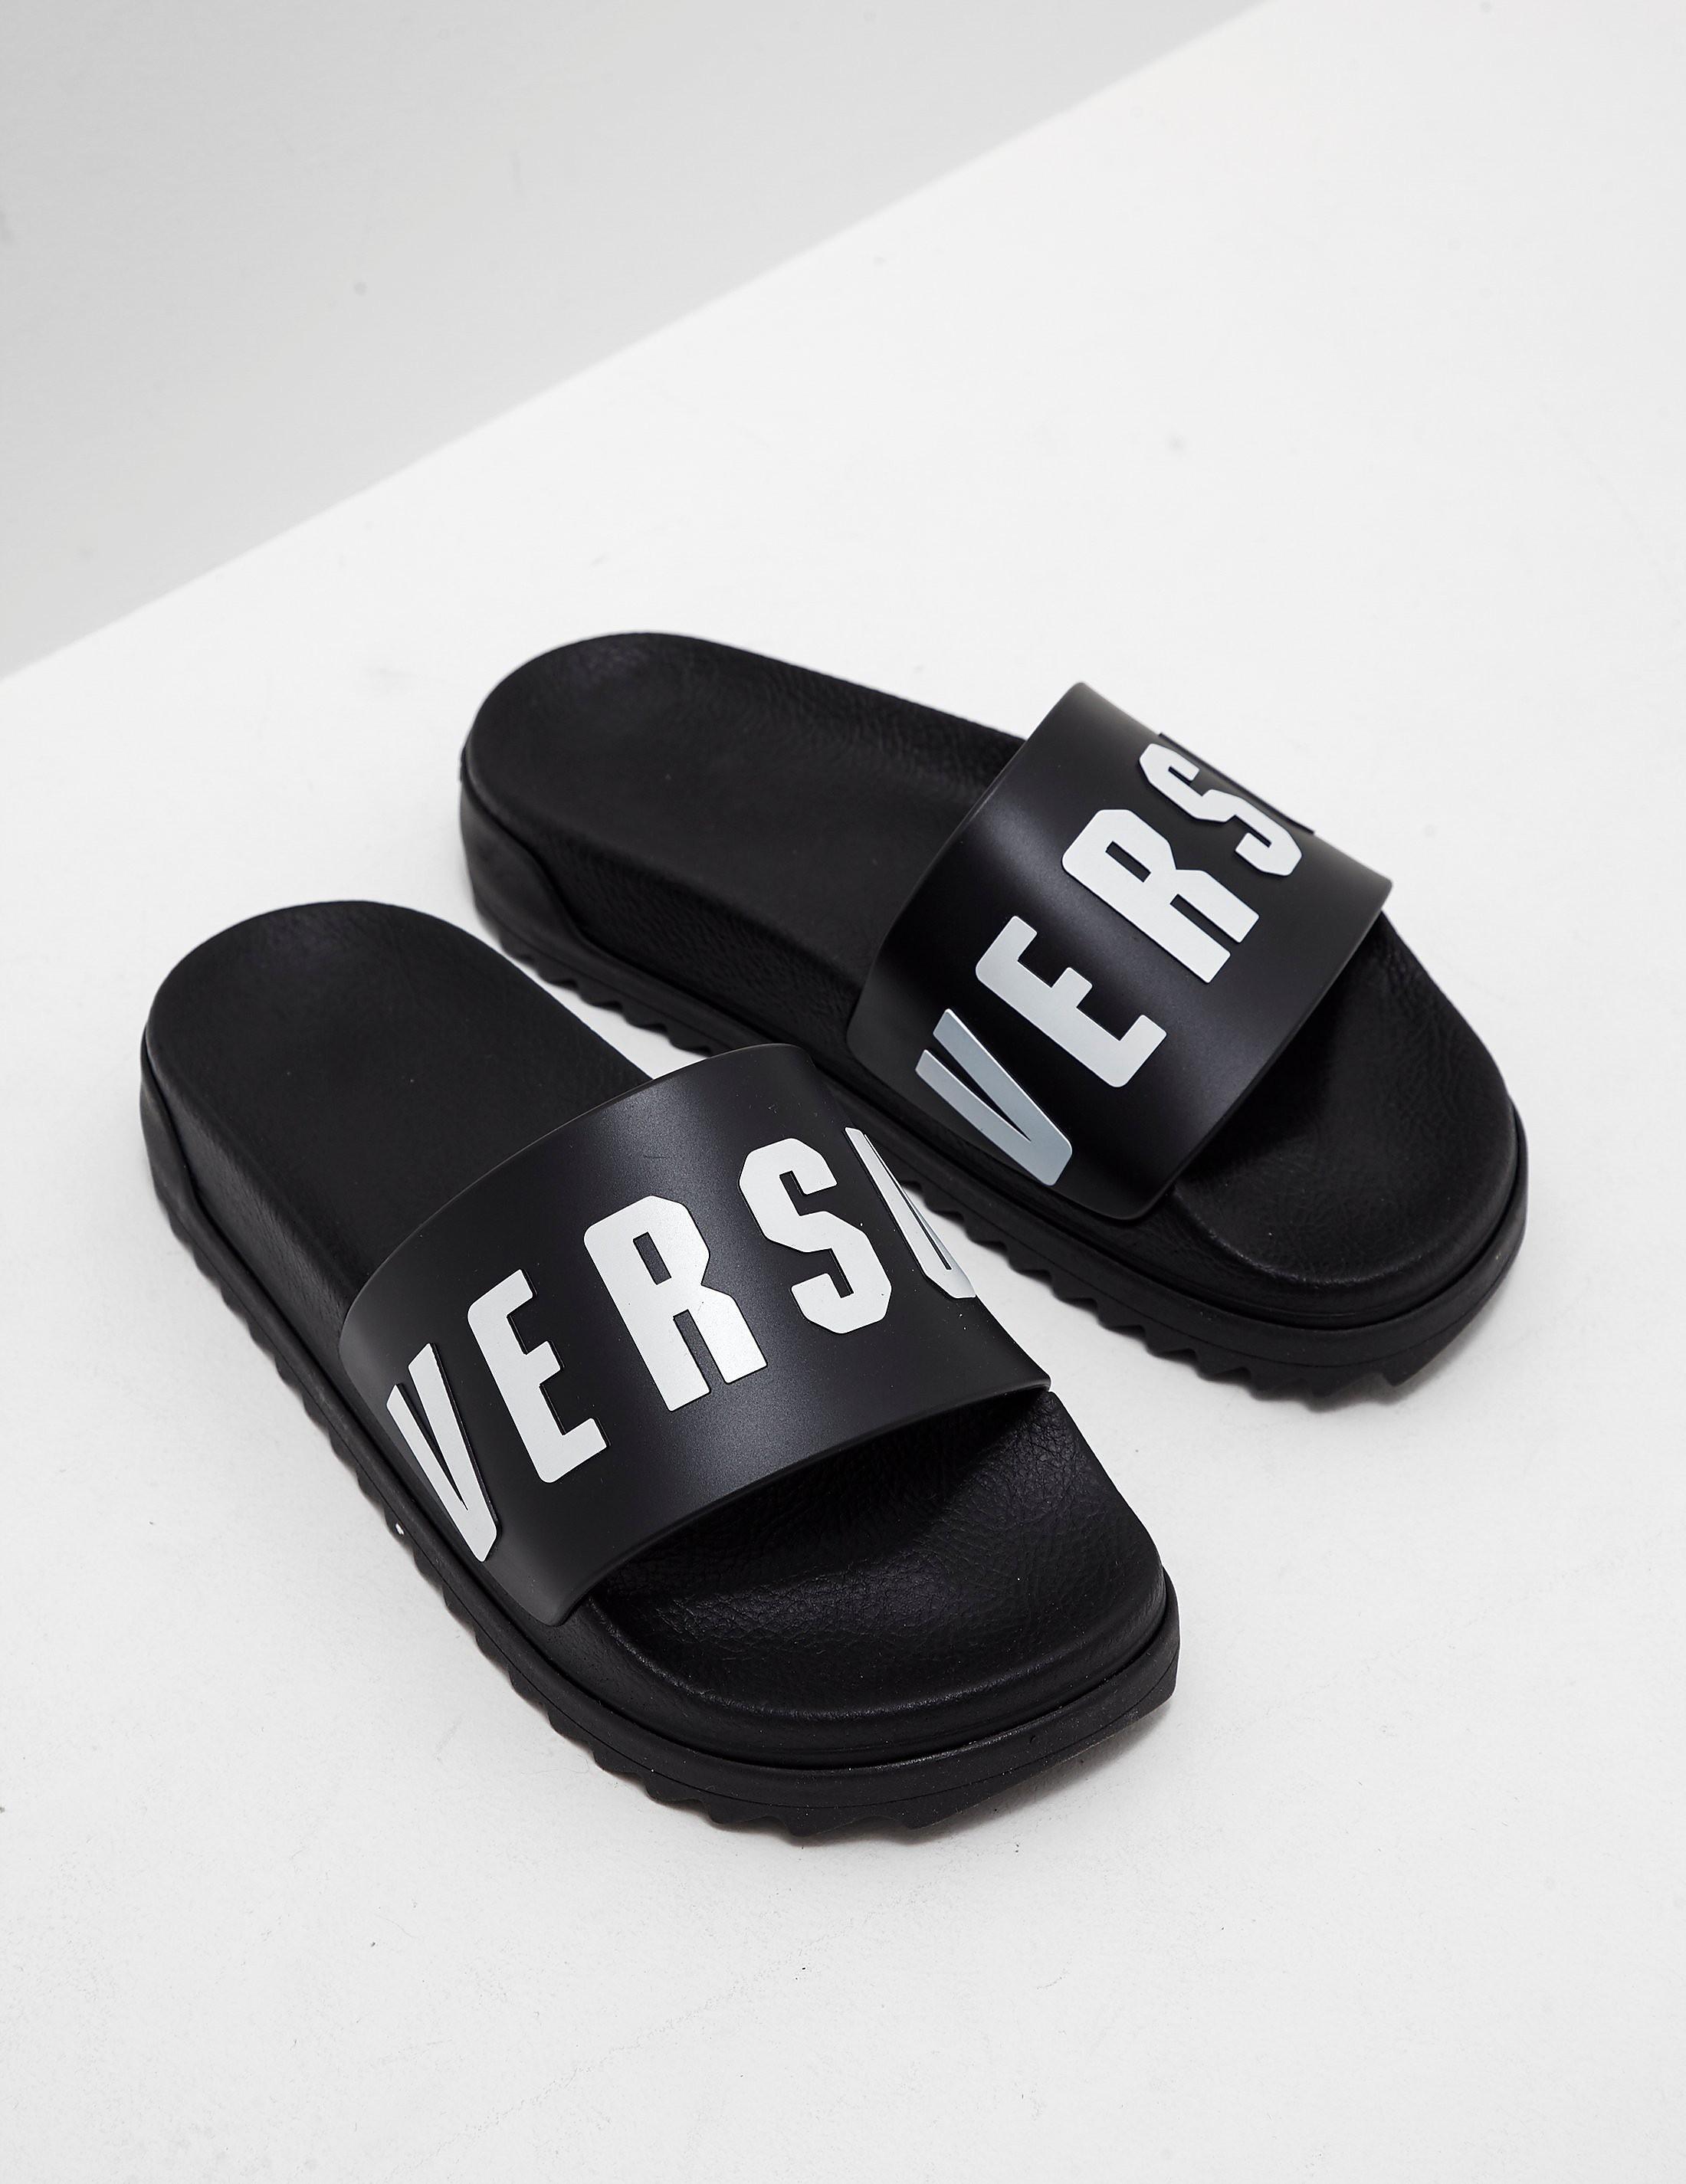 Versus Versace Slides